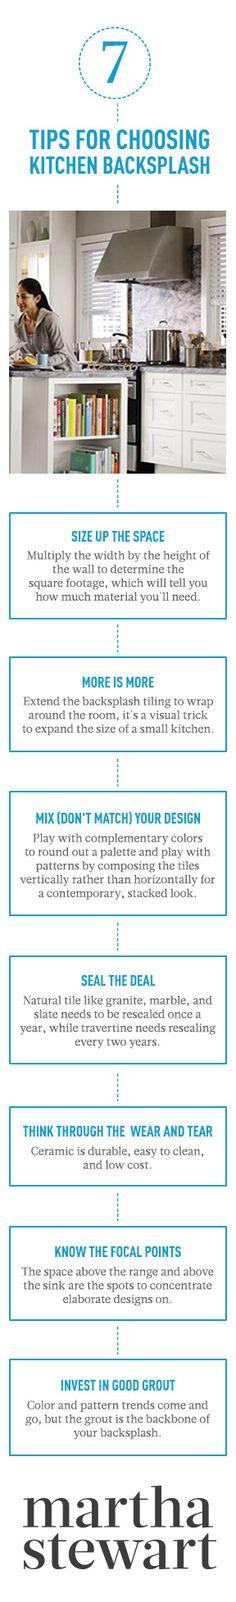 7 Tips for Choosing Kitchen Backsplash